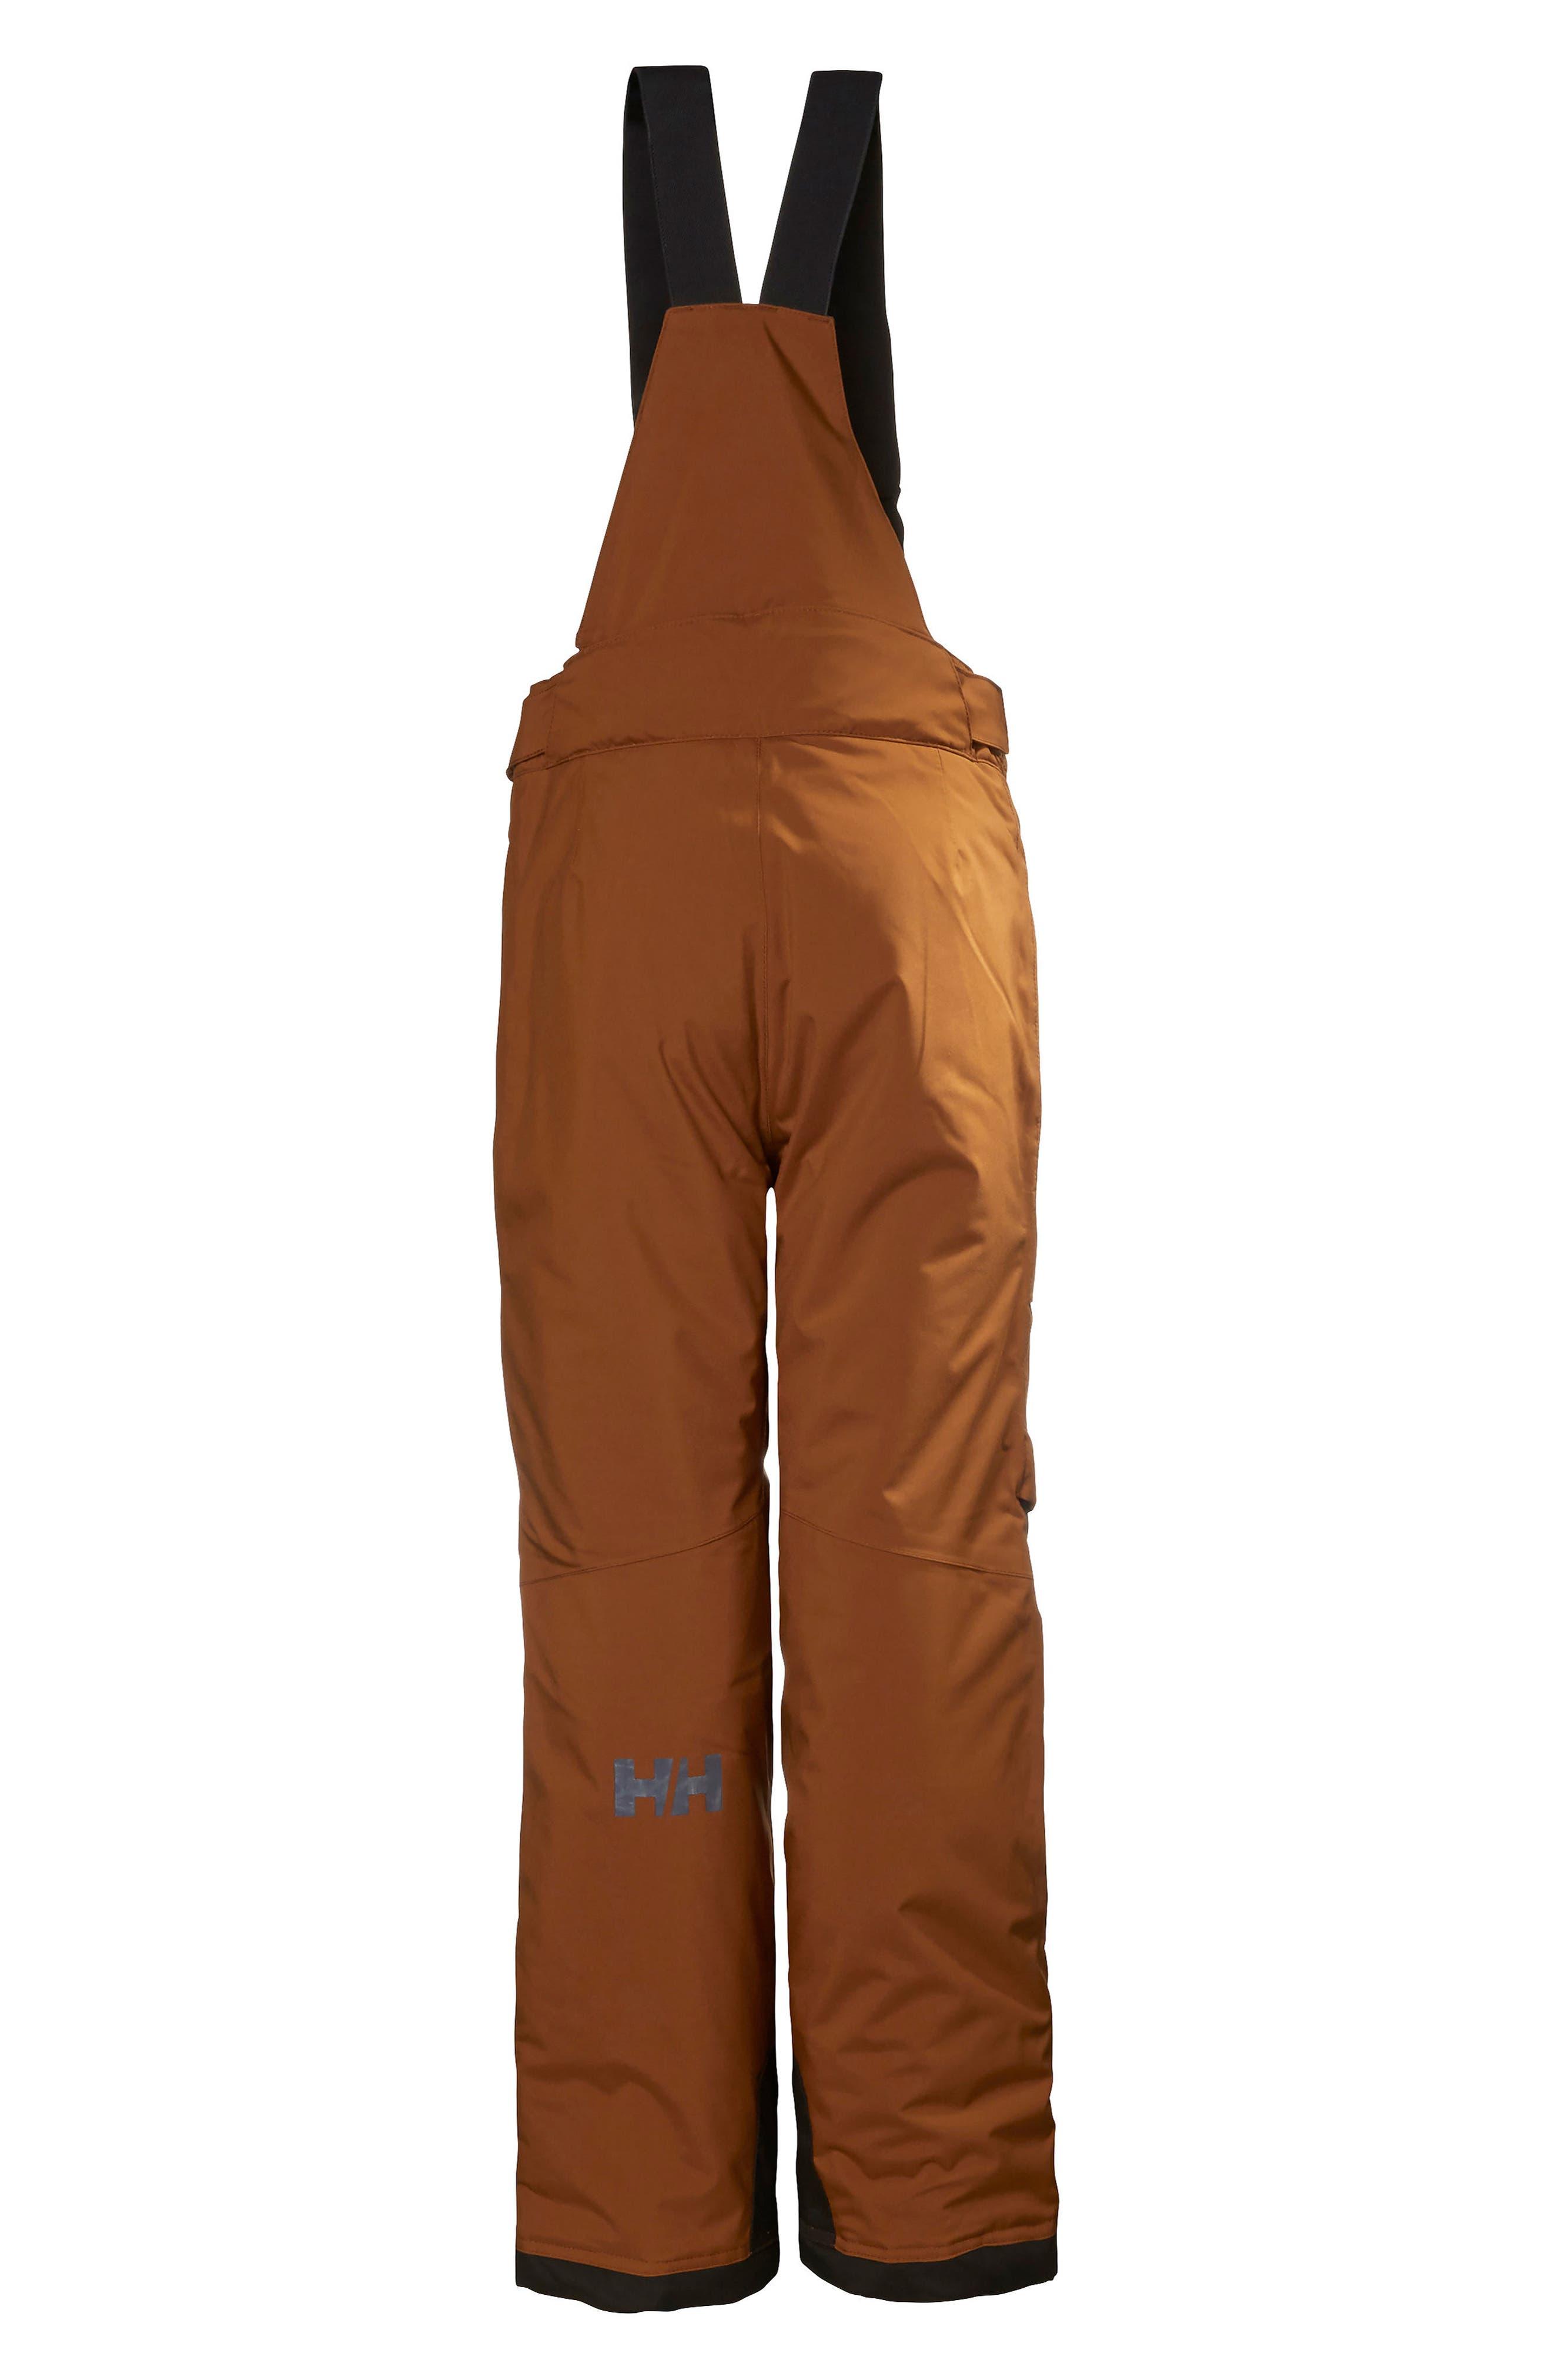 Jr. Powder Waterproof Ski Pants,                             Alternate thumbnail 2, color,                             201